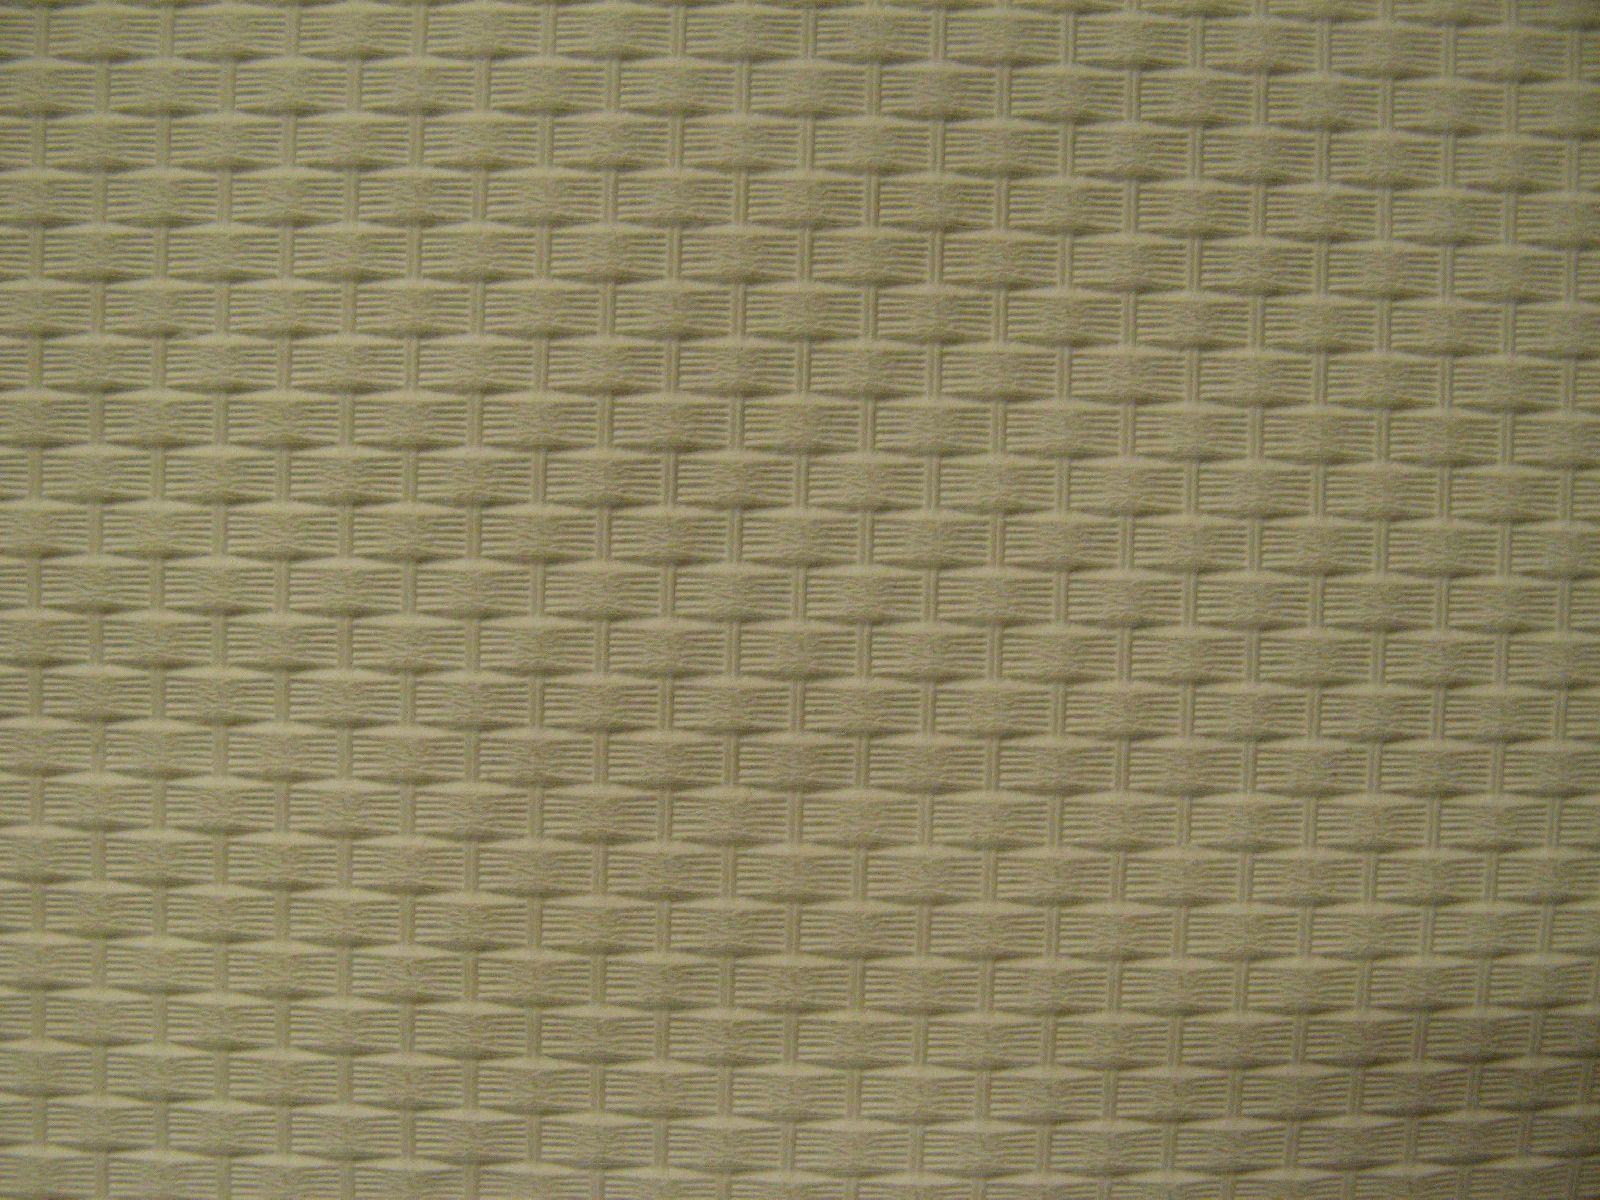 Innenraum-Material_Textur_B_4725